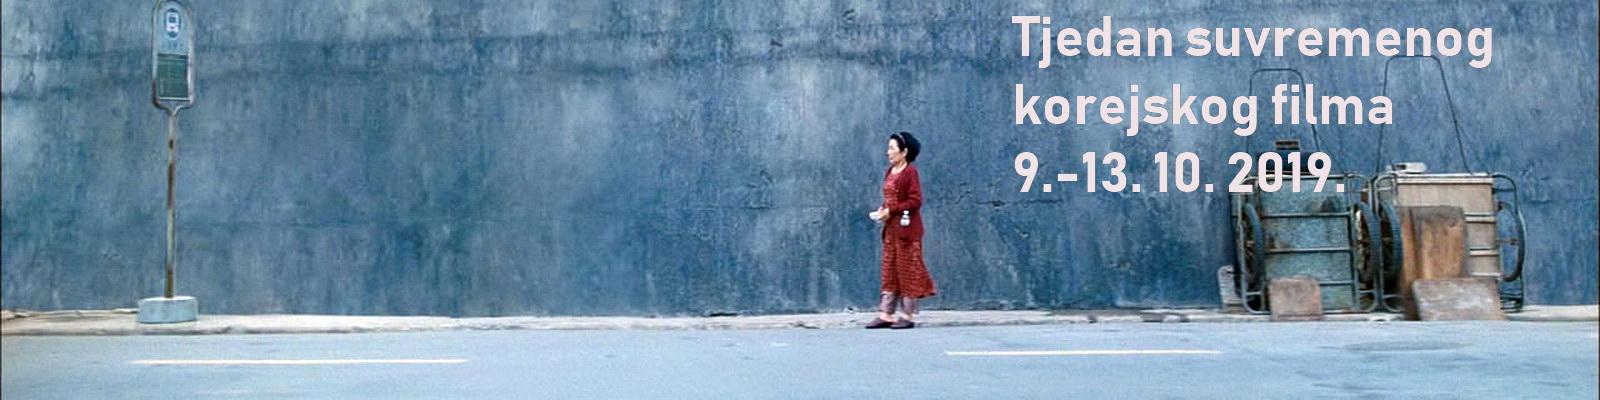 Tjedan korejskog filma